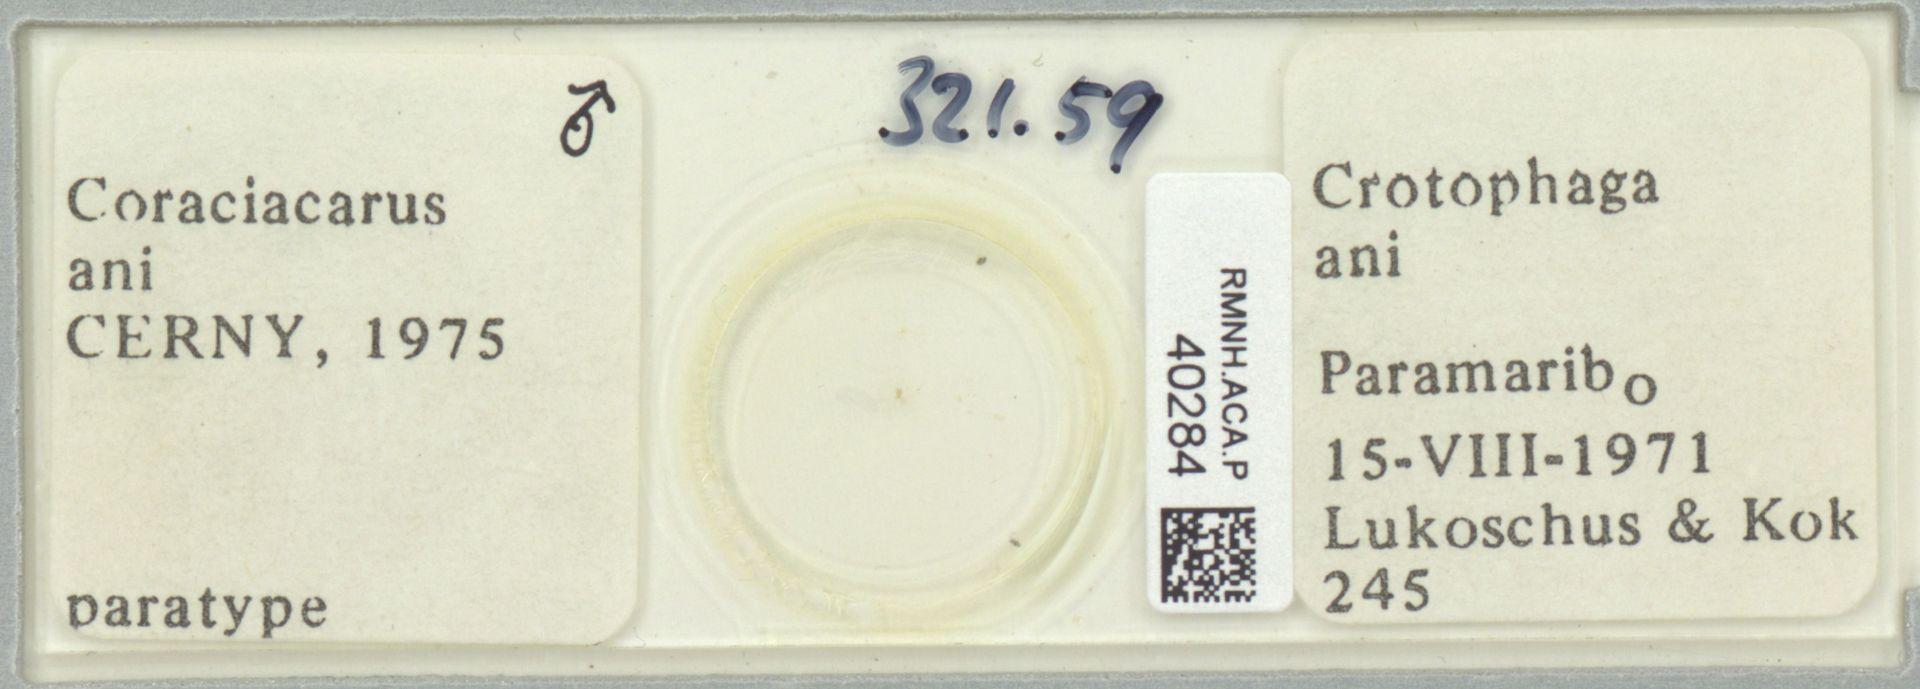 RMNH.ACA.P.40284 | Coraciacarus ani Cerny, 1975